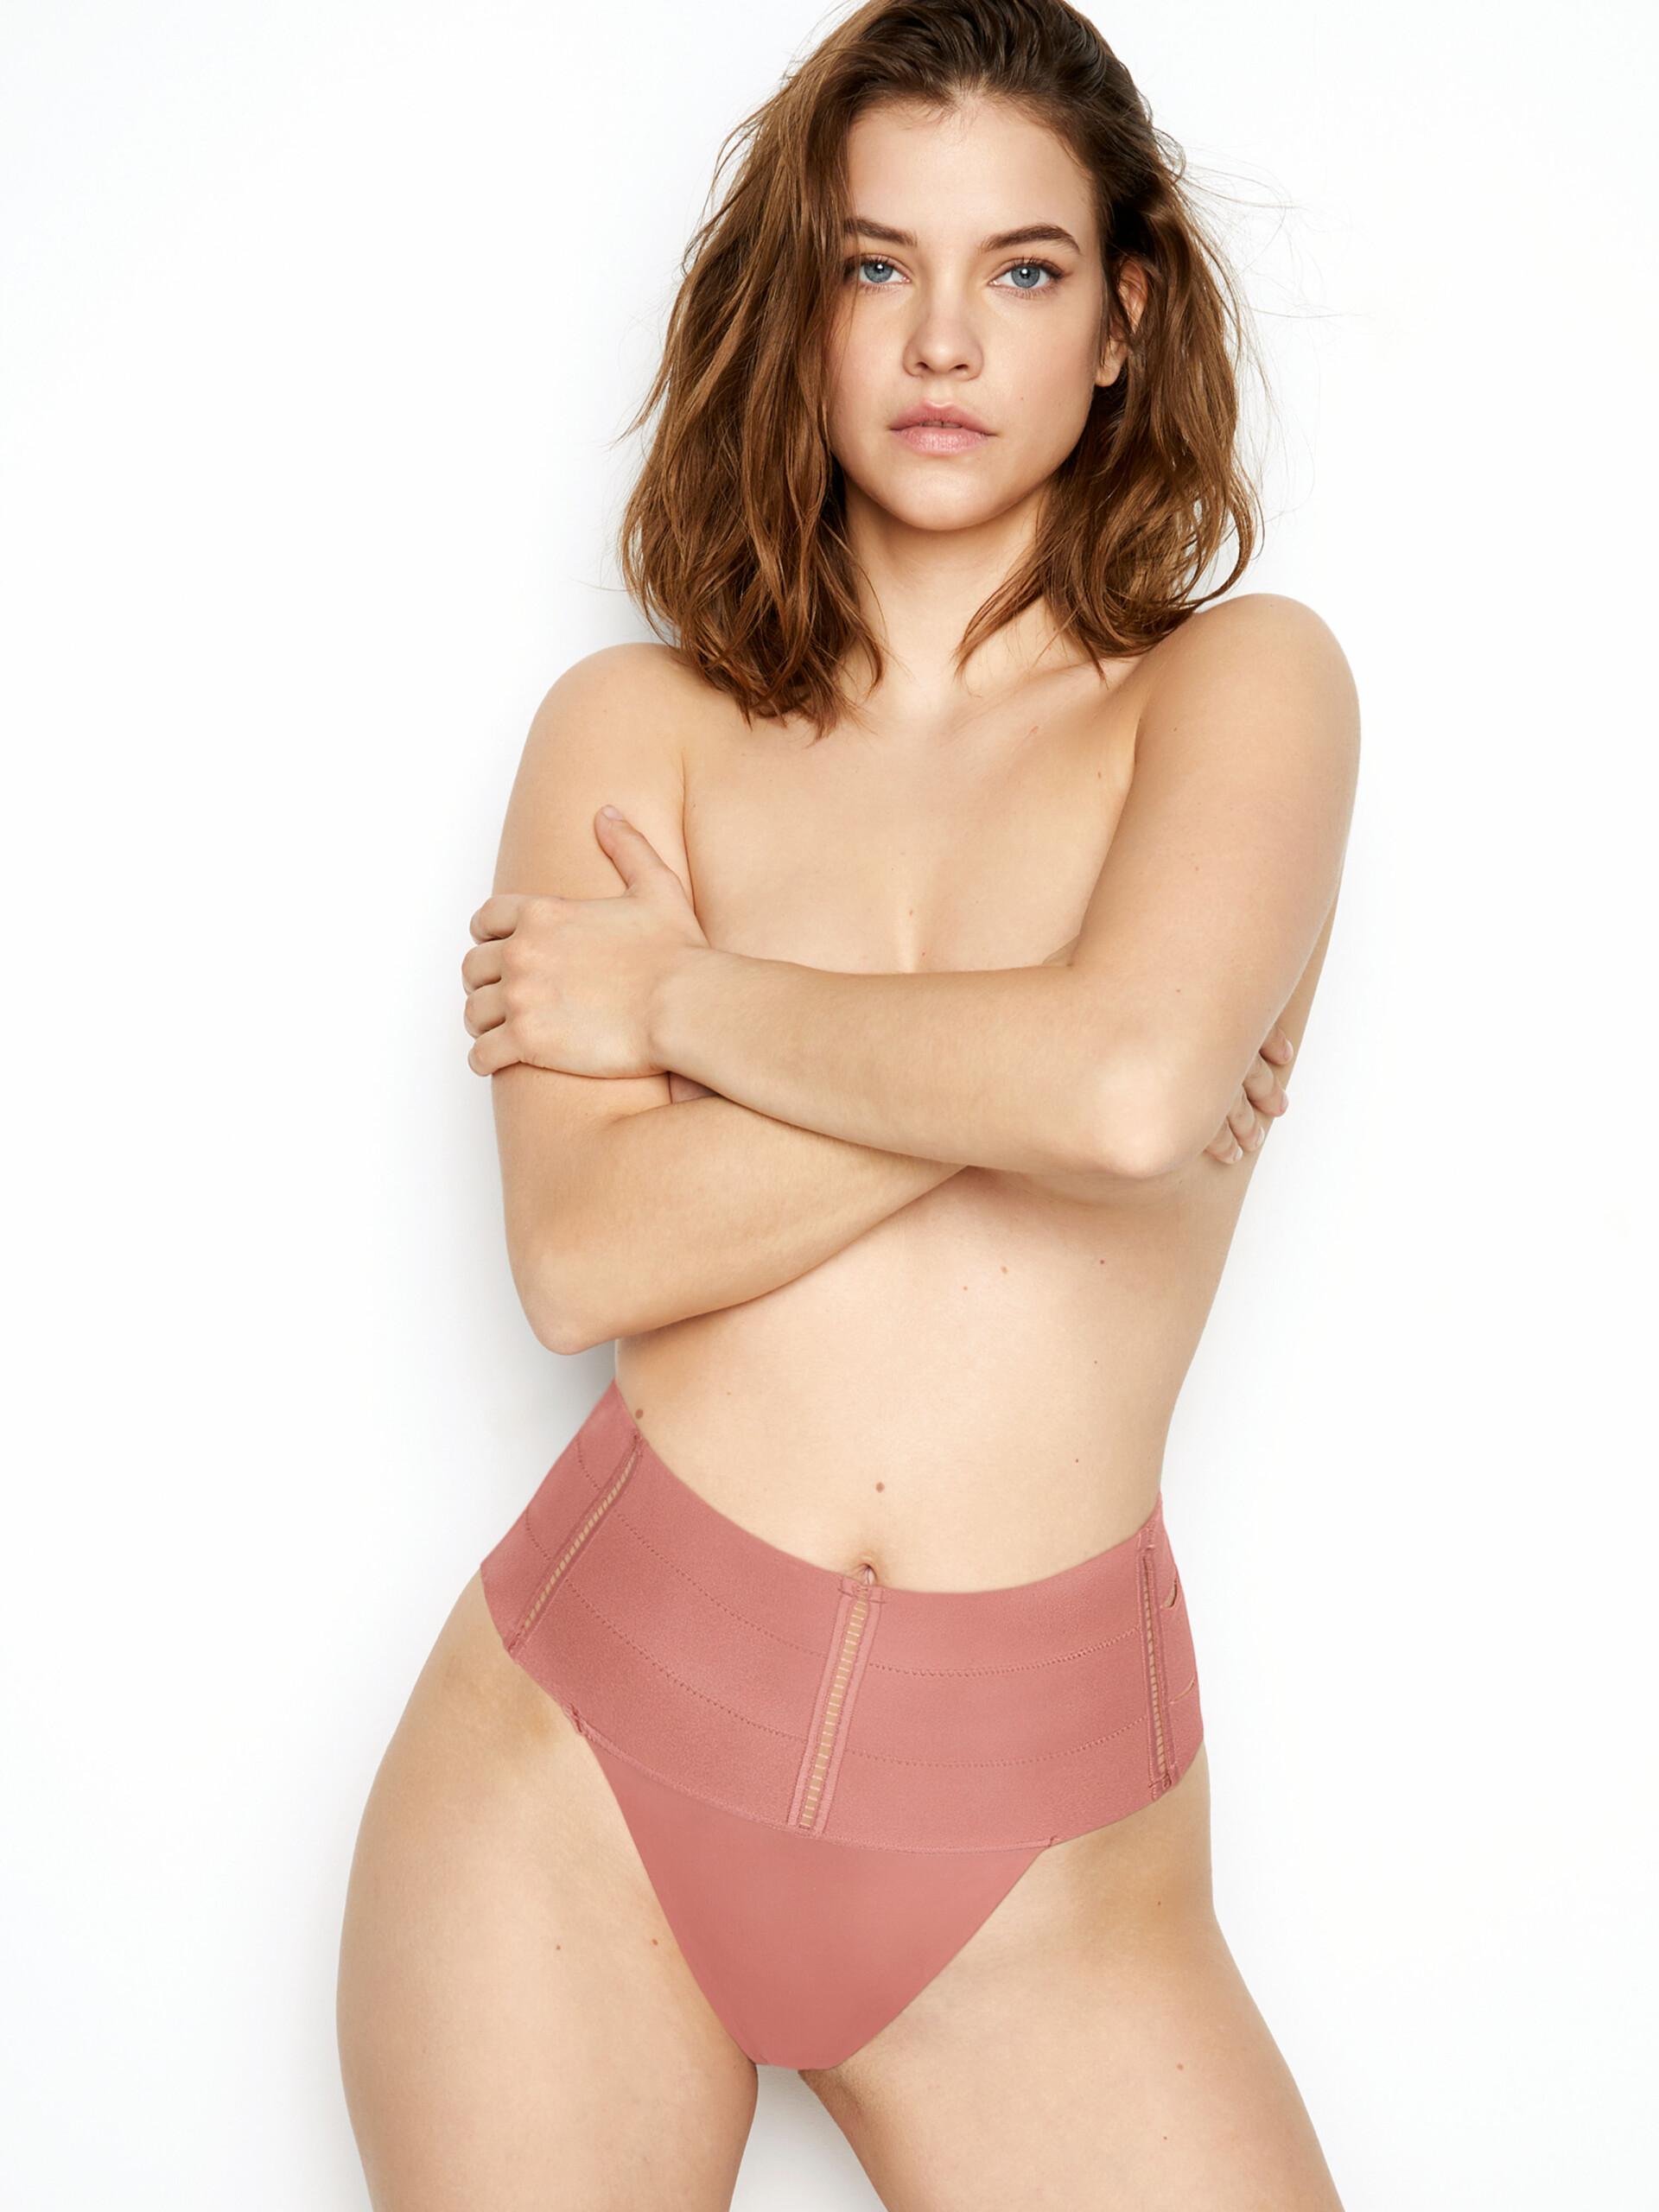 Barbara Palvin - Victorias Secret Lingerie Photoshoot